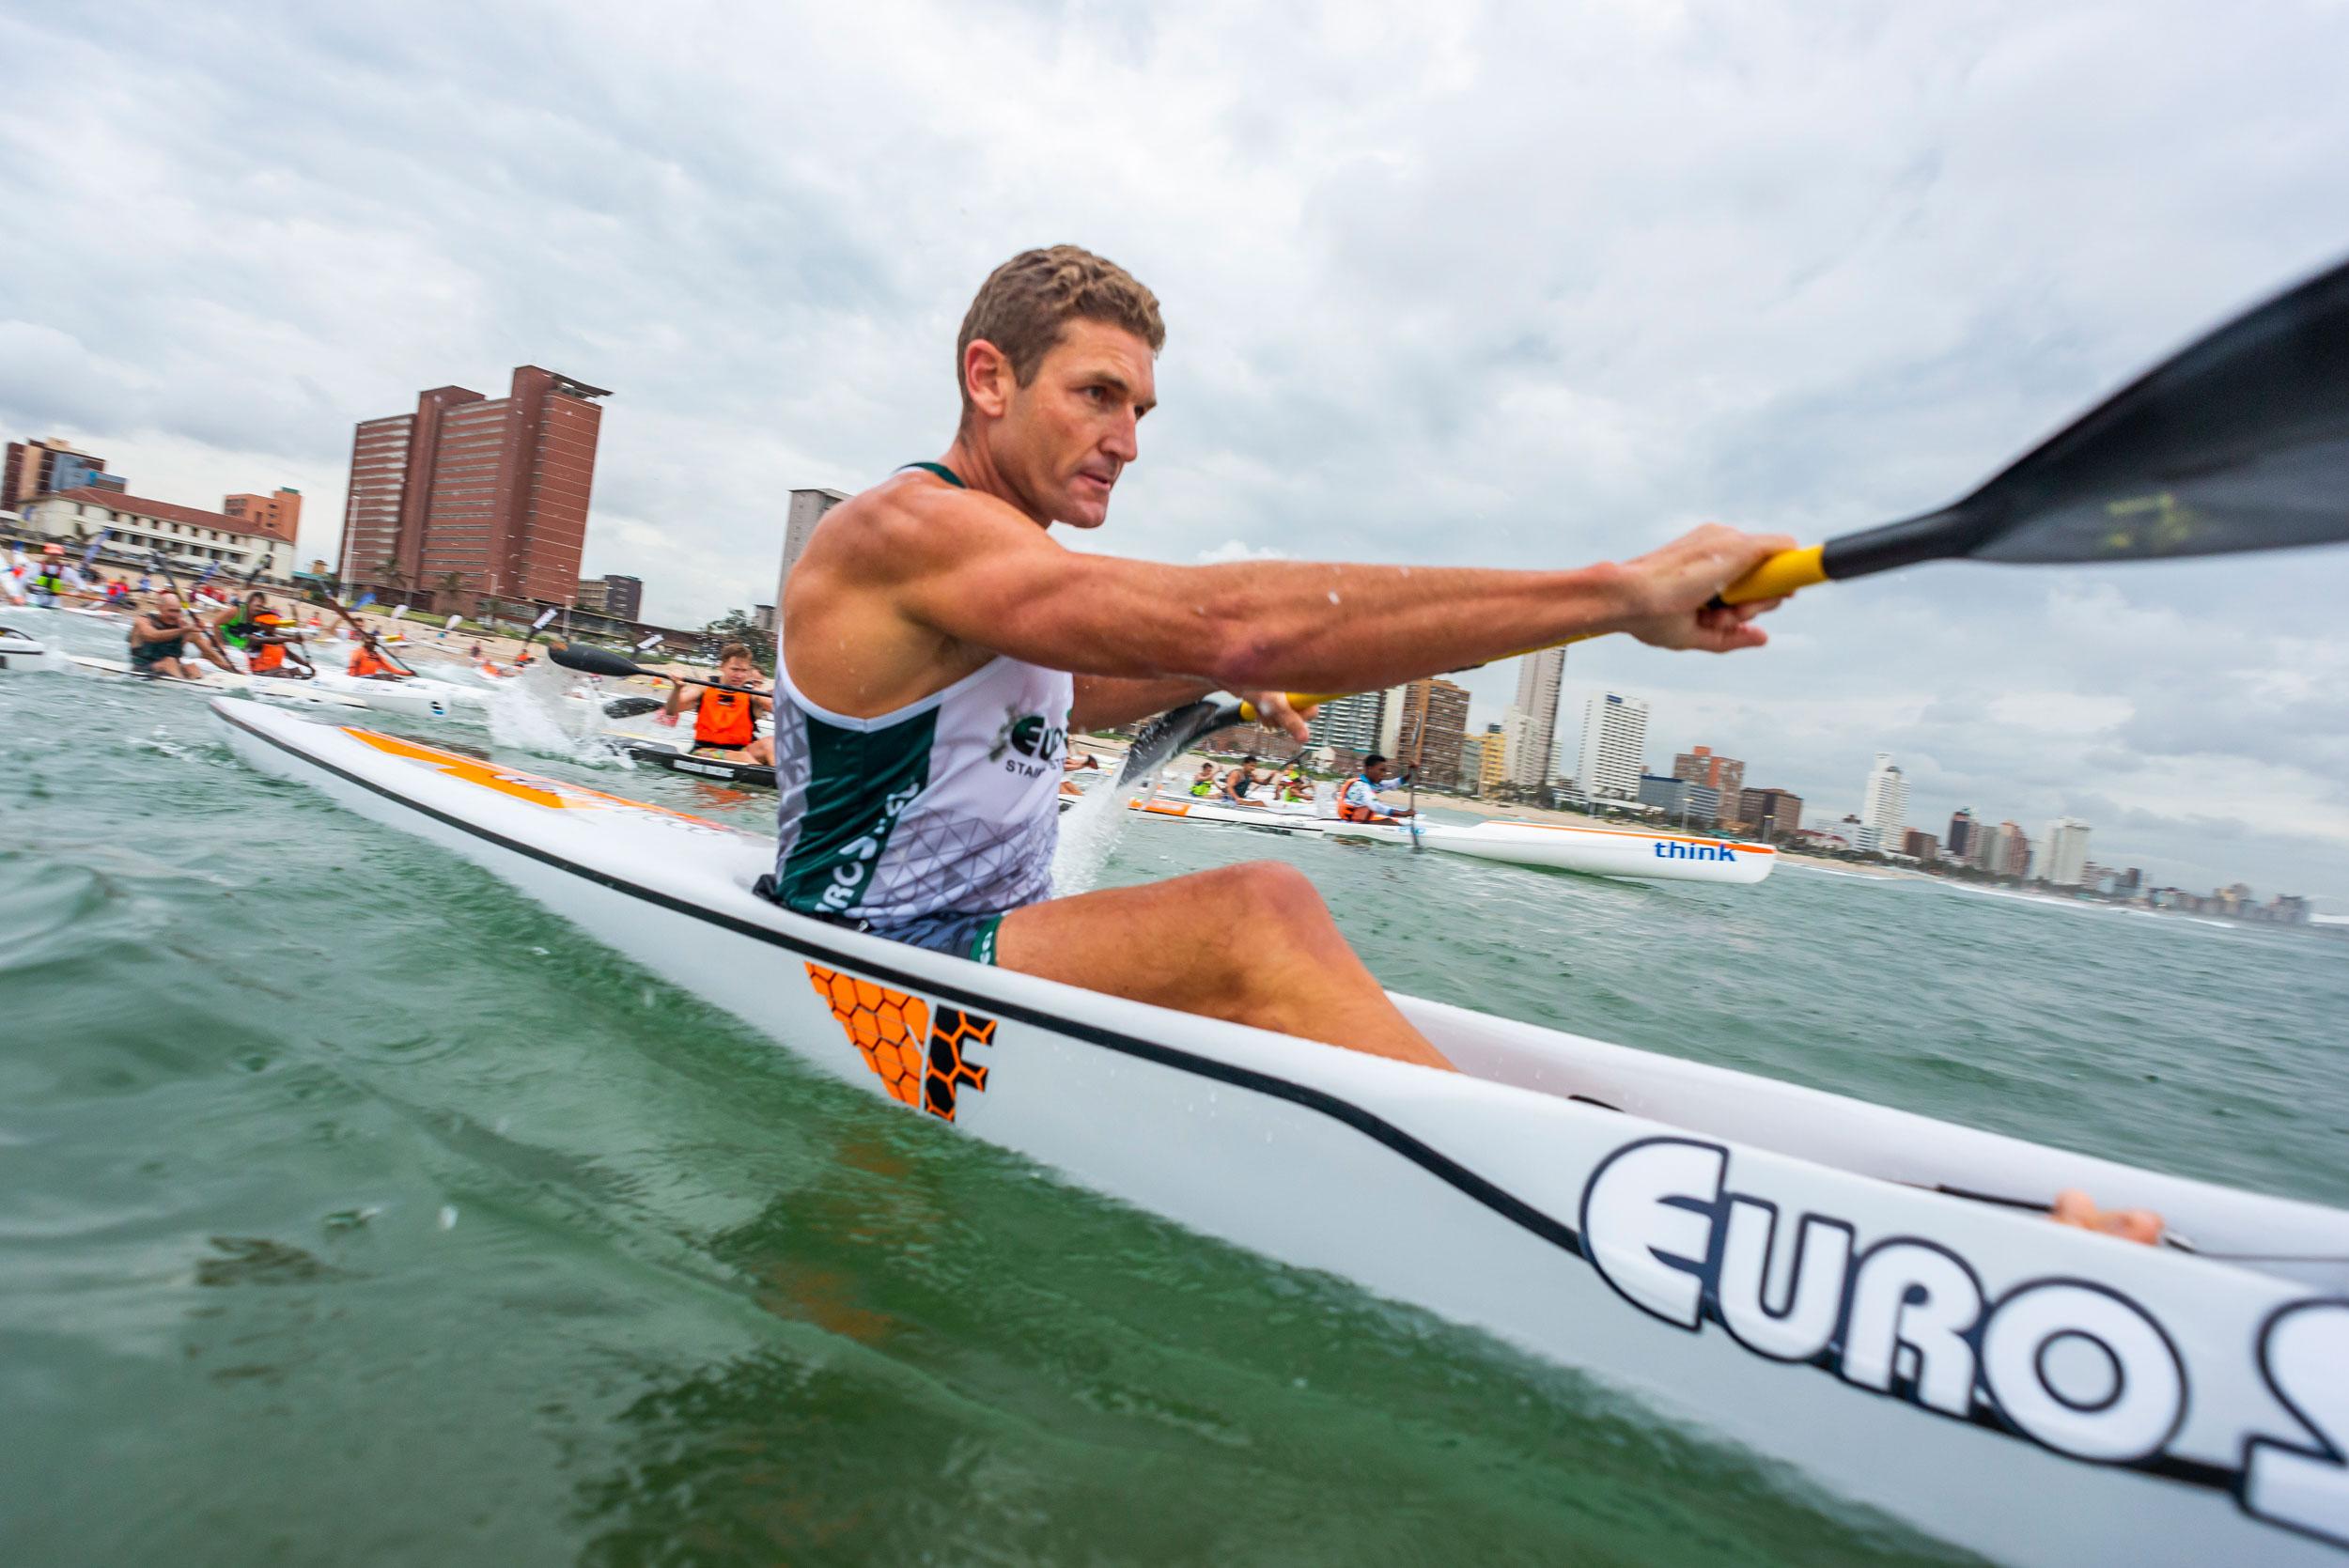 More surfski silverware for McGregor